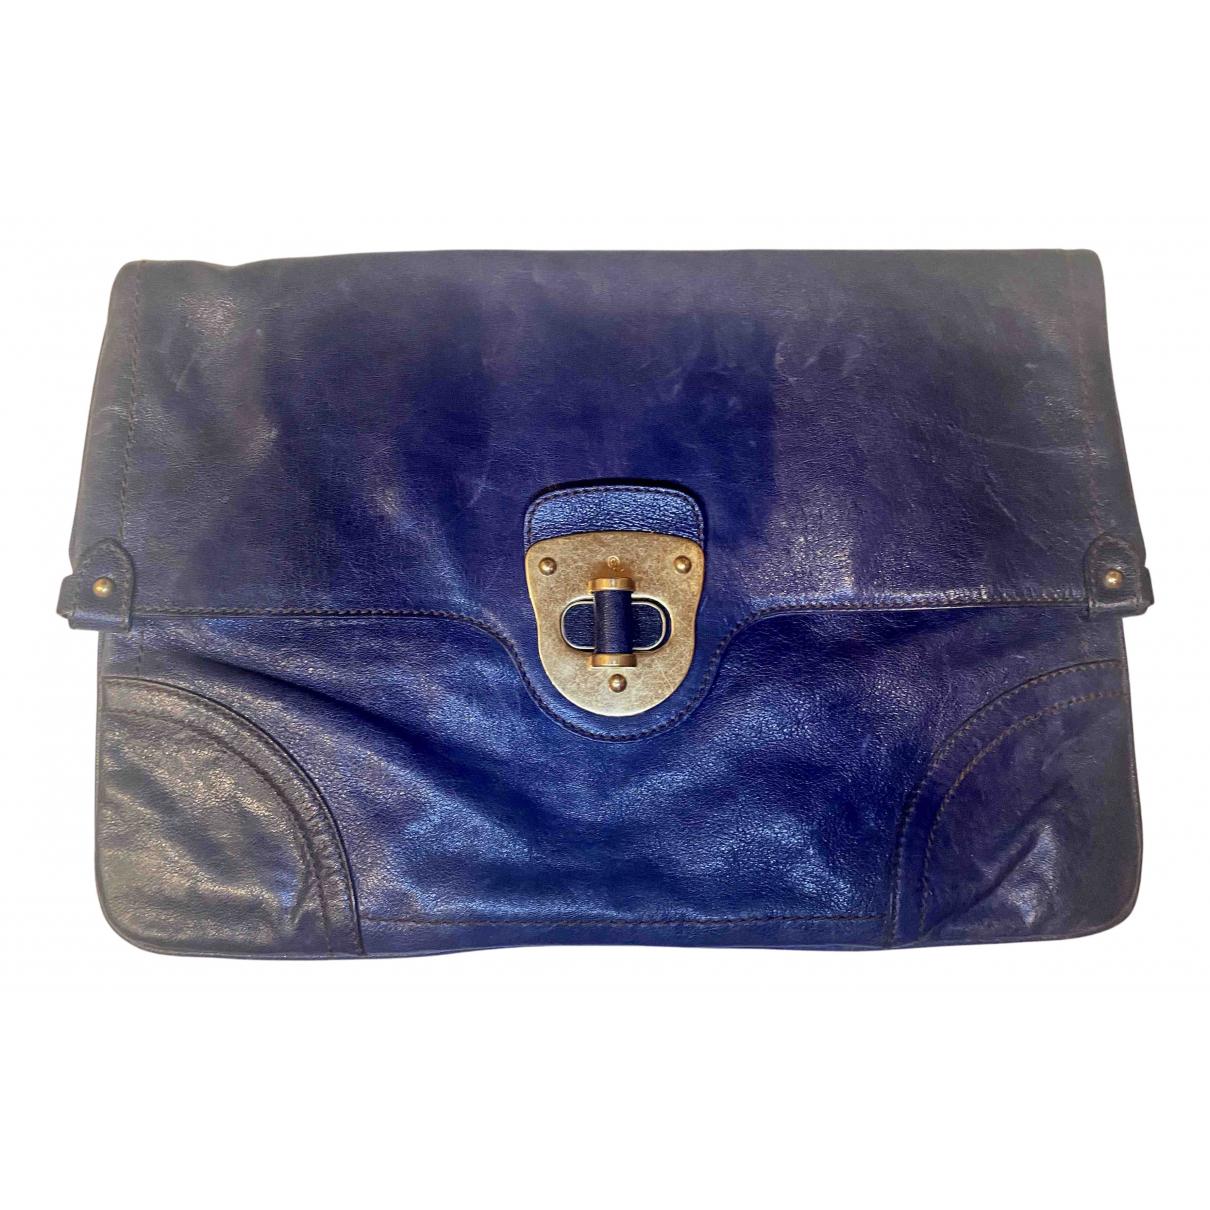 Alexander Mcqueen N Blue Leather Clutch bag for Women N